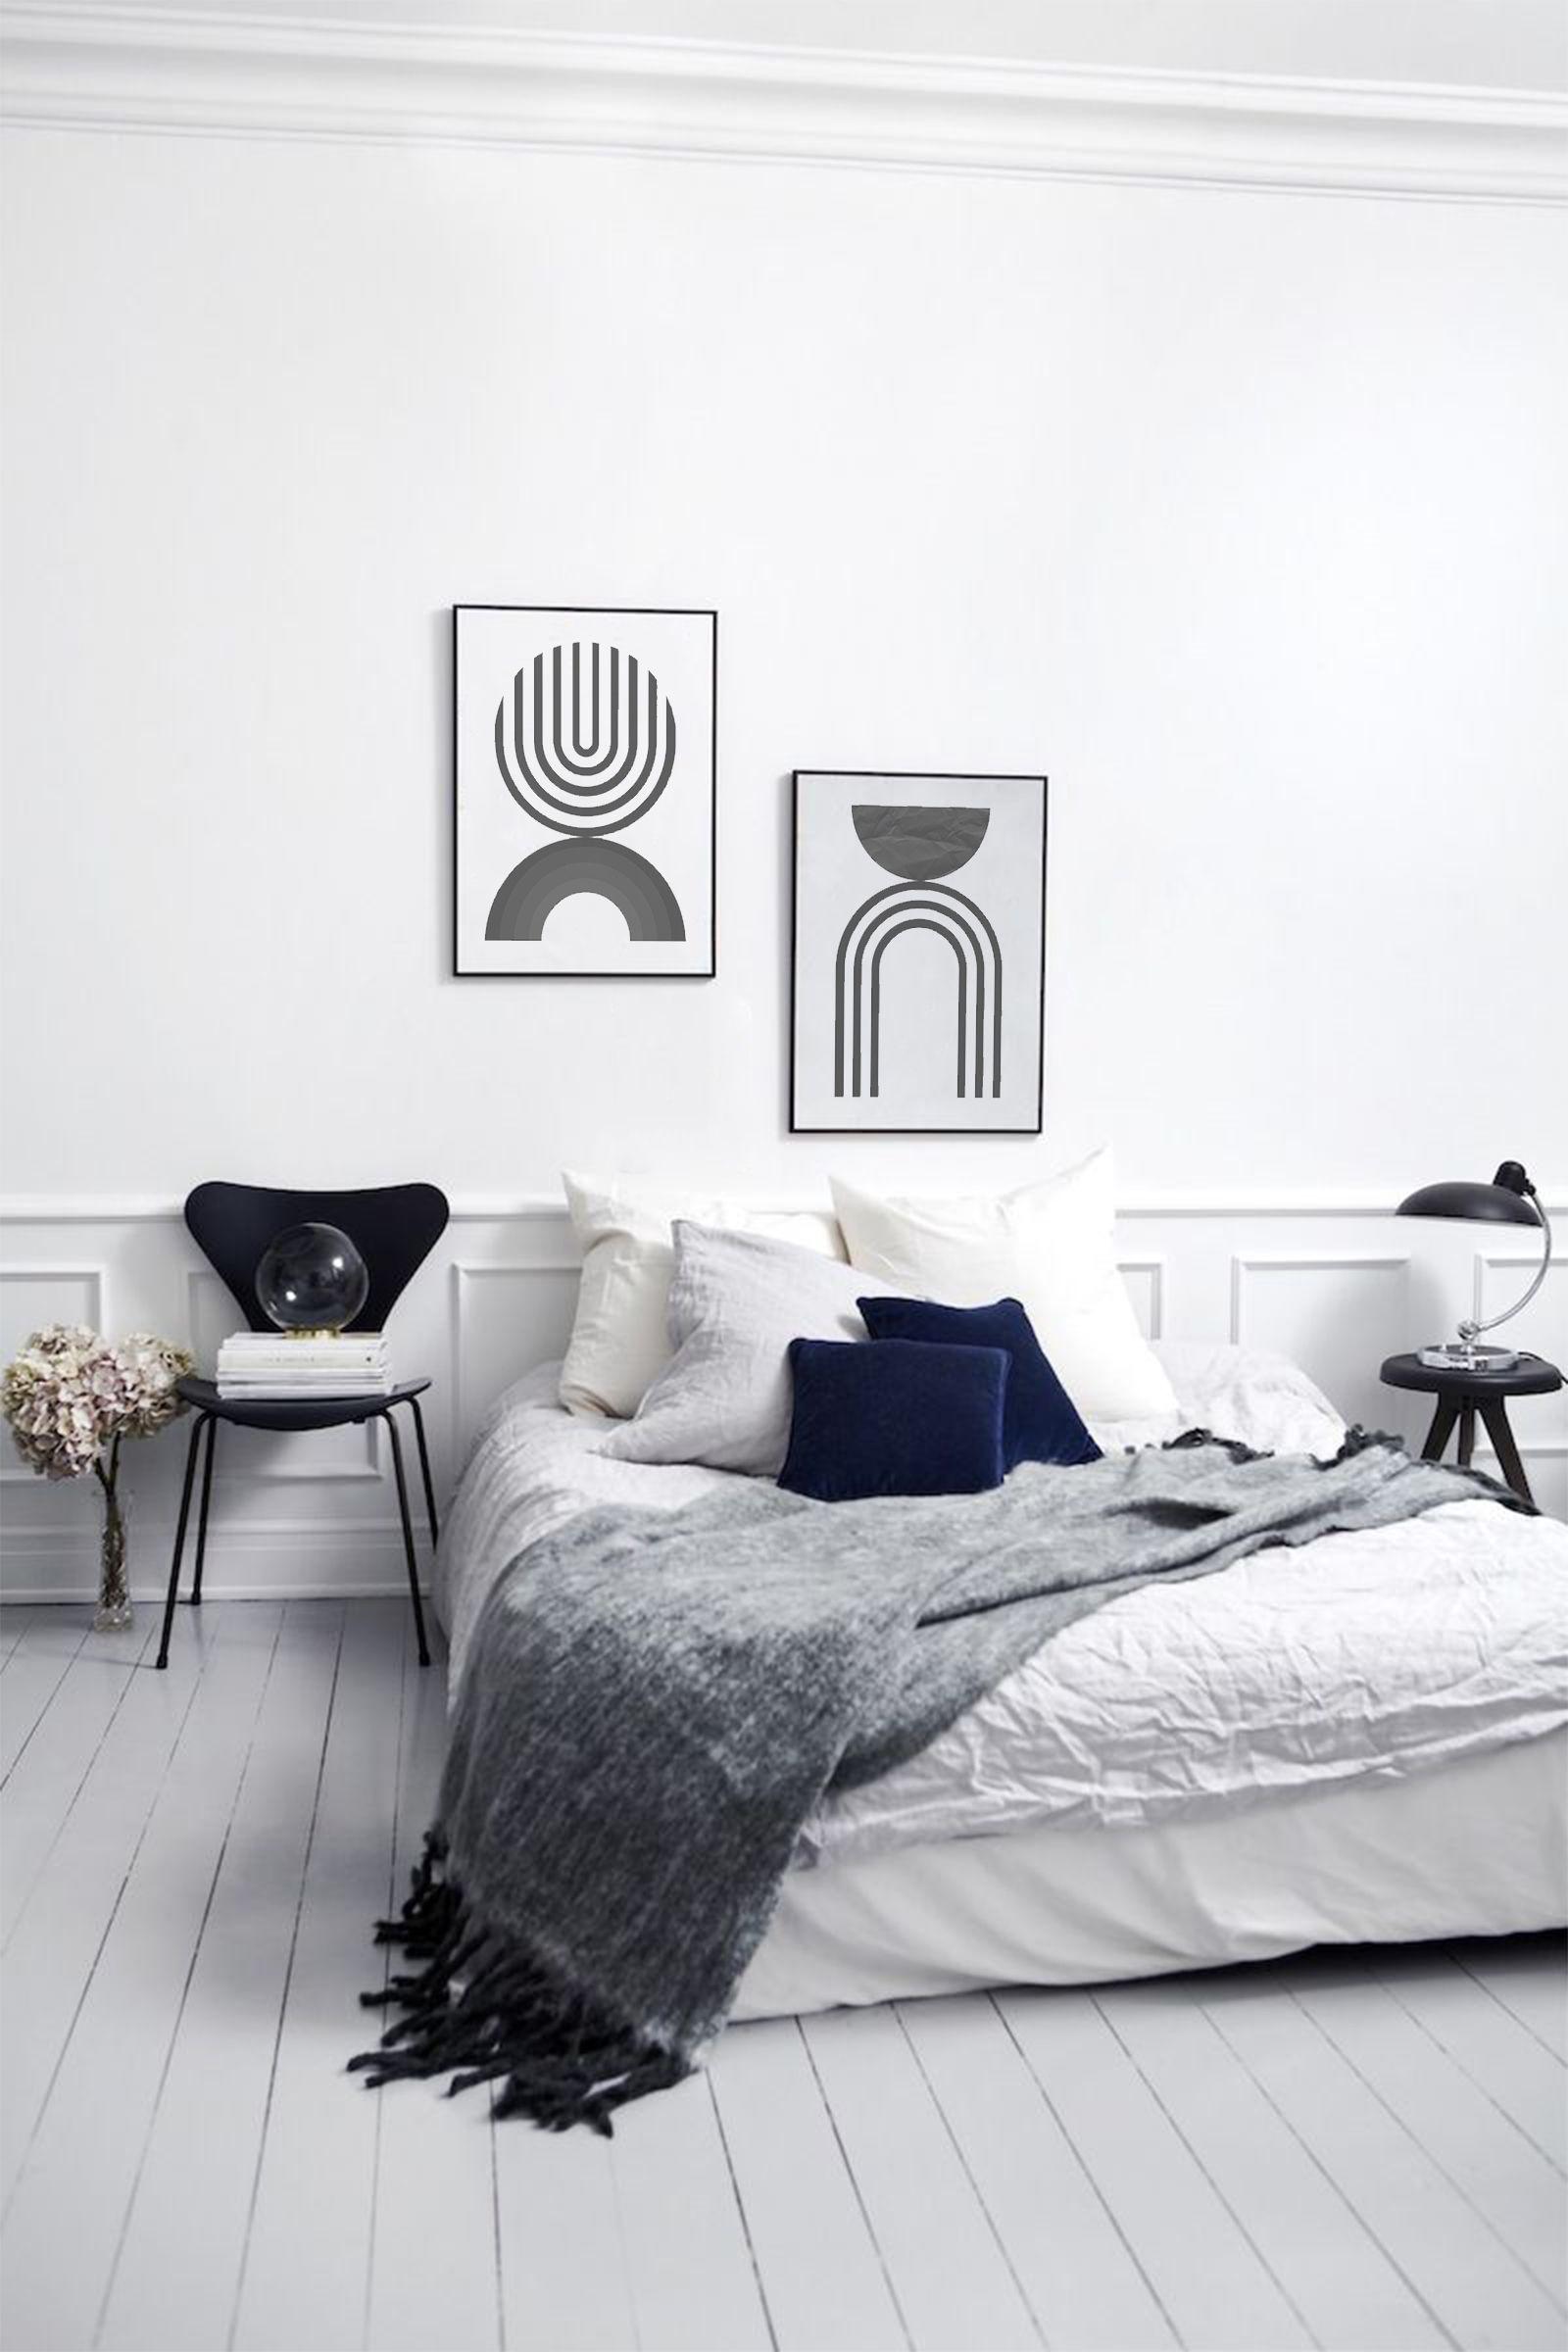 Black White Print Abstract Print Art Minimalist Geometric Etsy In 2020 Bedroom Design Trends Bedroom Interior Minimalist Bedroom Design